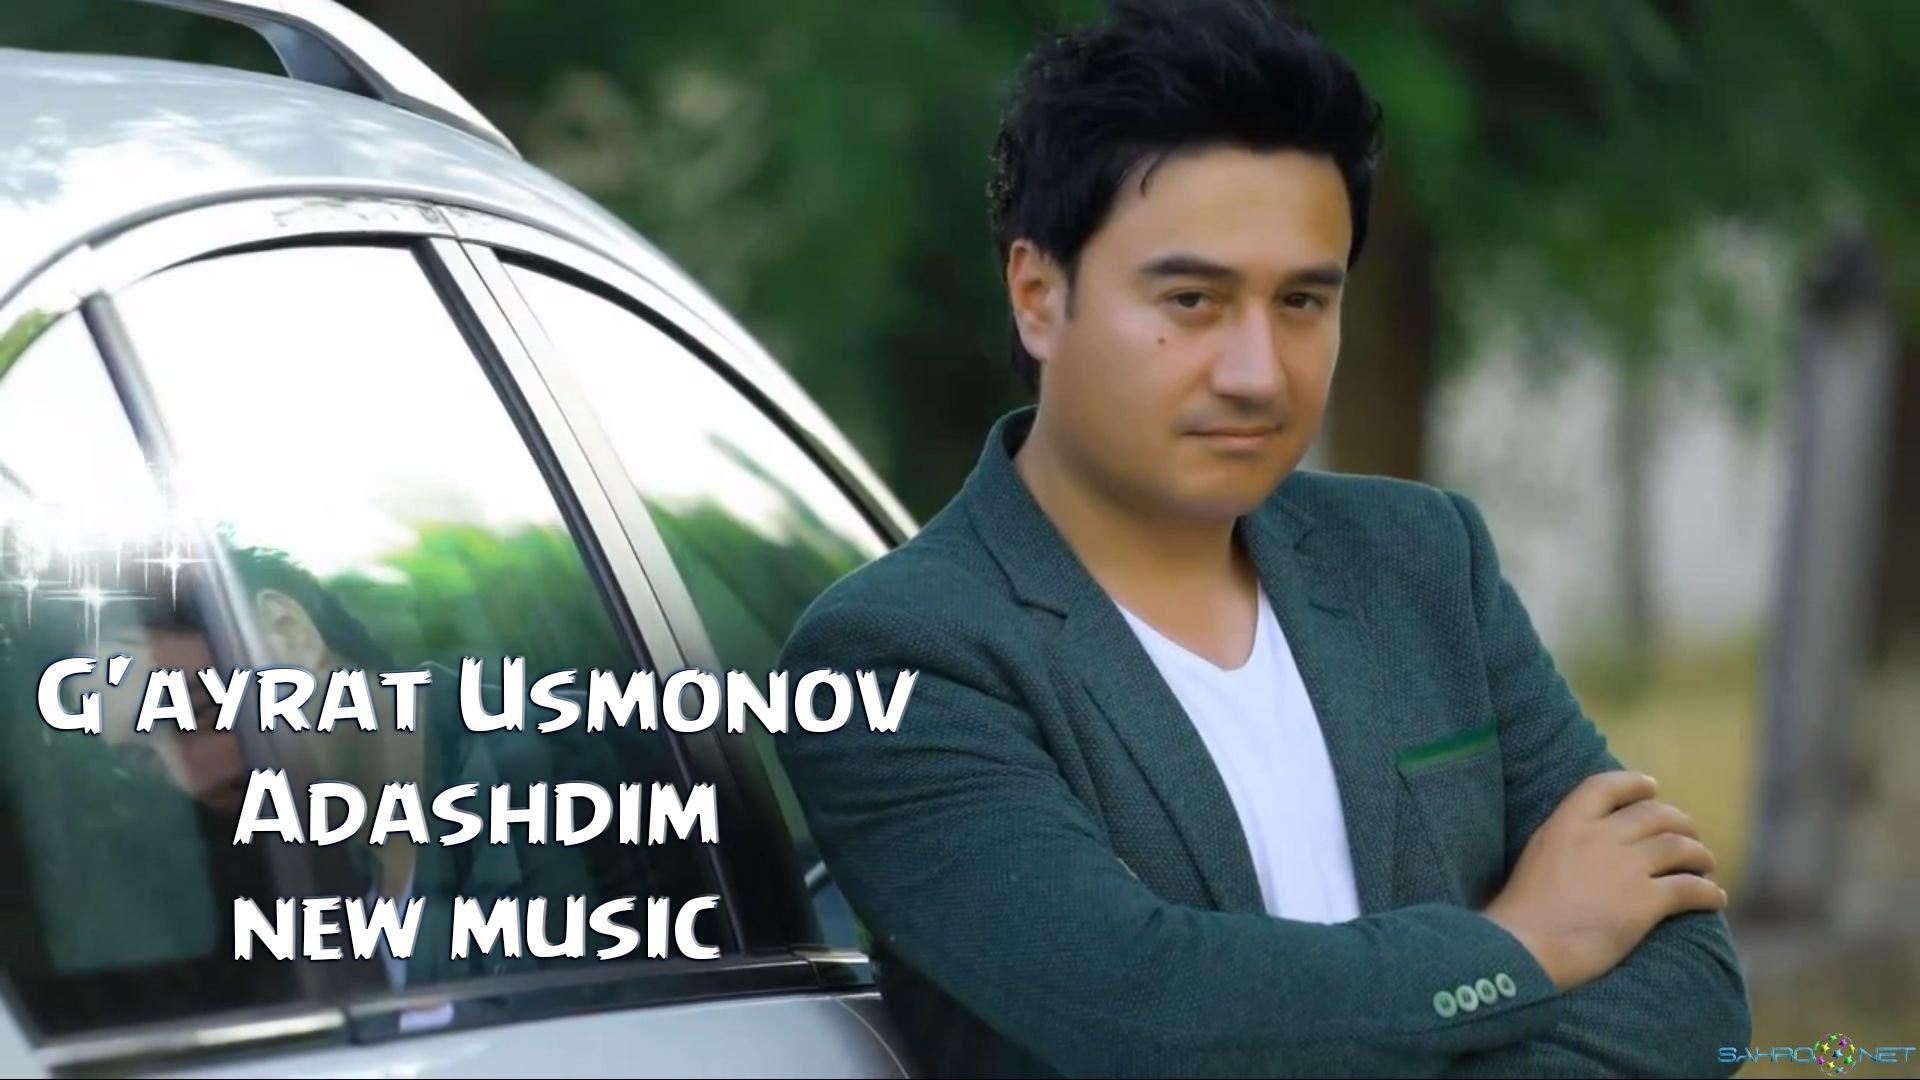 G'ayrat Usmonov - Adashdim (new music) 2015